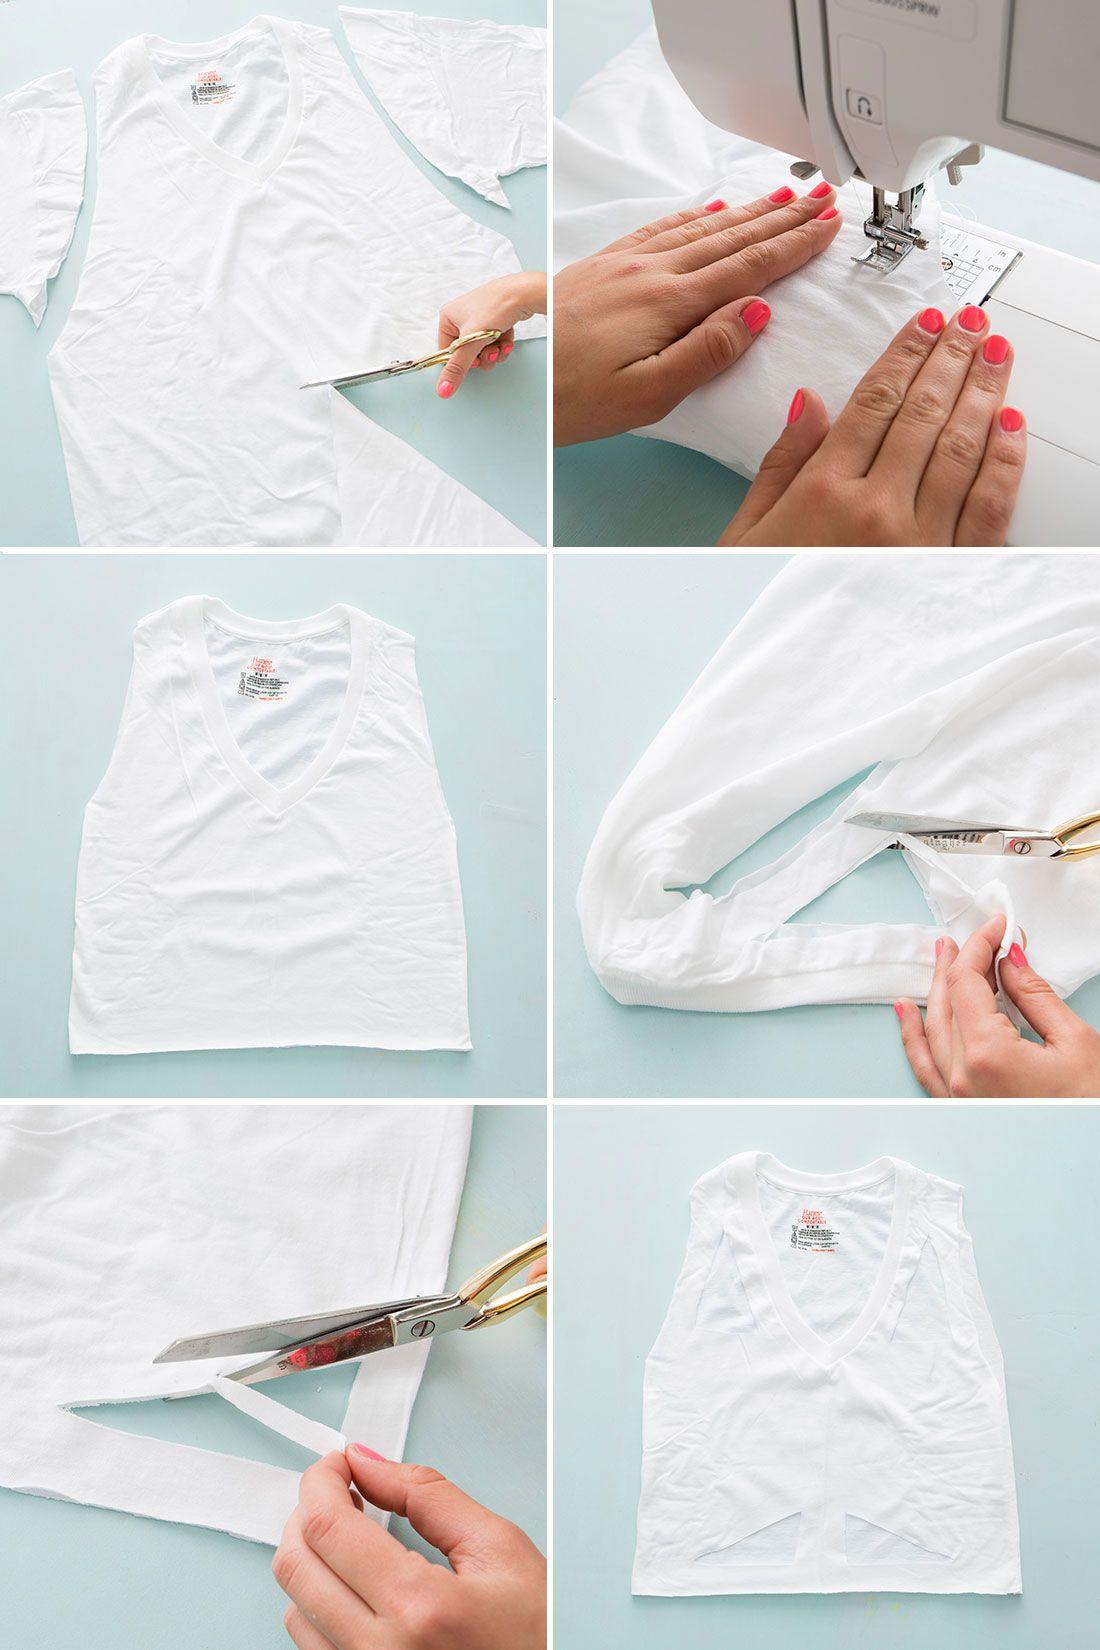 10 Ways to Cut Up + Restyle a Plain White T-Shirt | Shirt hacks ...